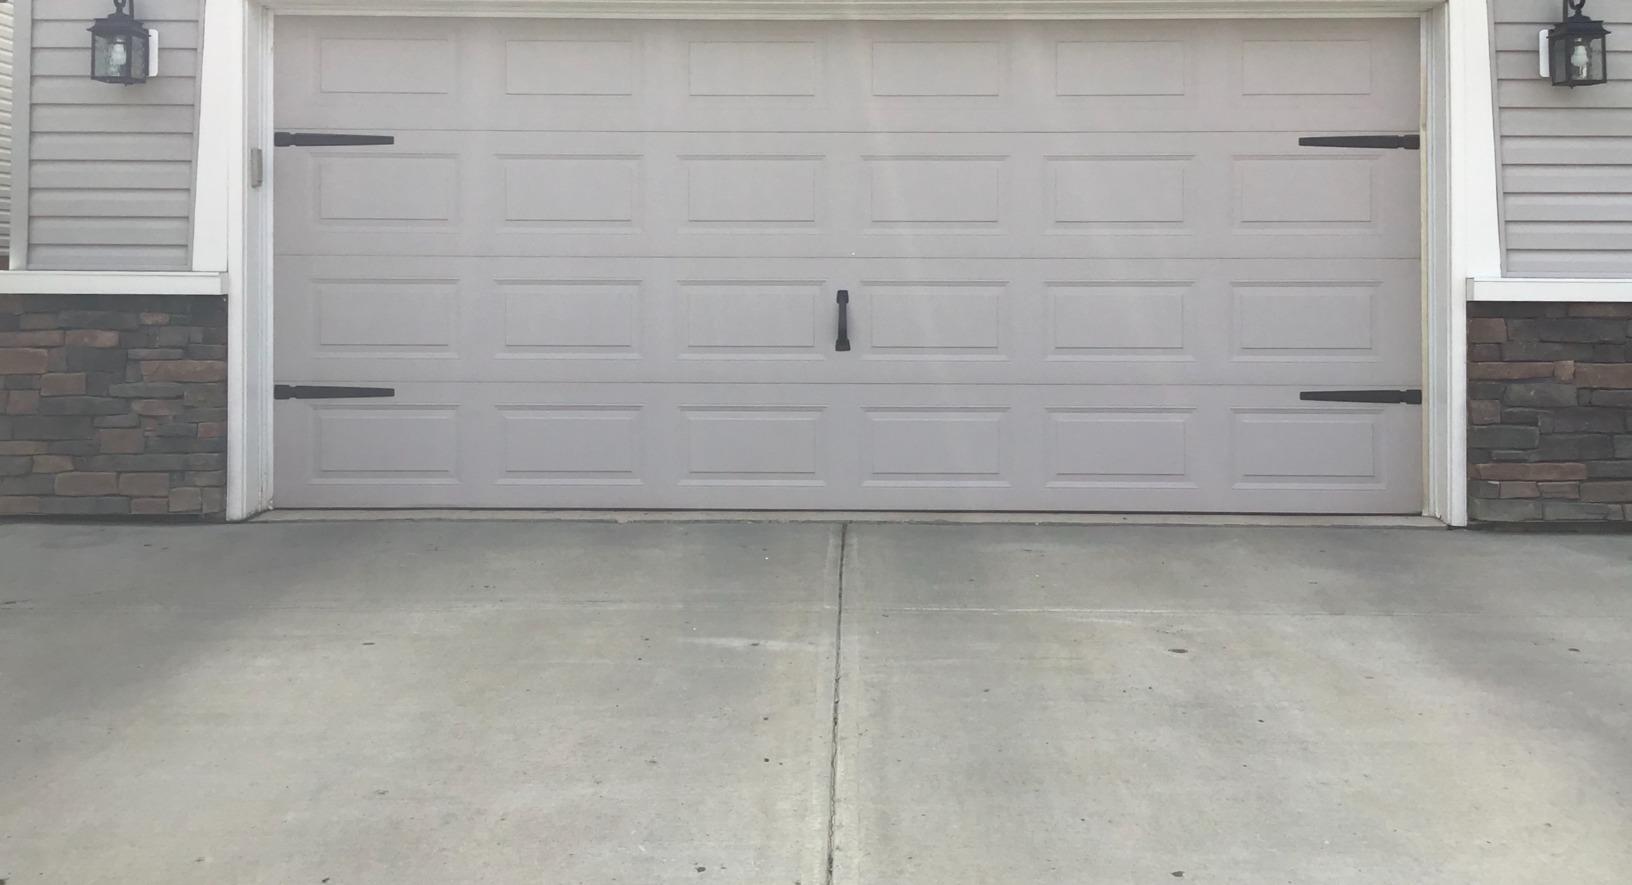 Sunken Driveway Leveled to Meet Garage Pad in Edmonton, AB - After Photo